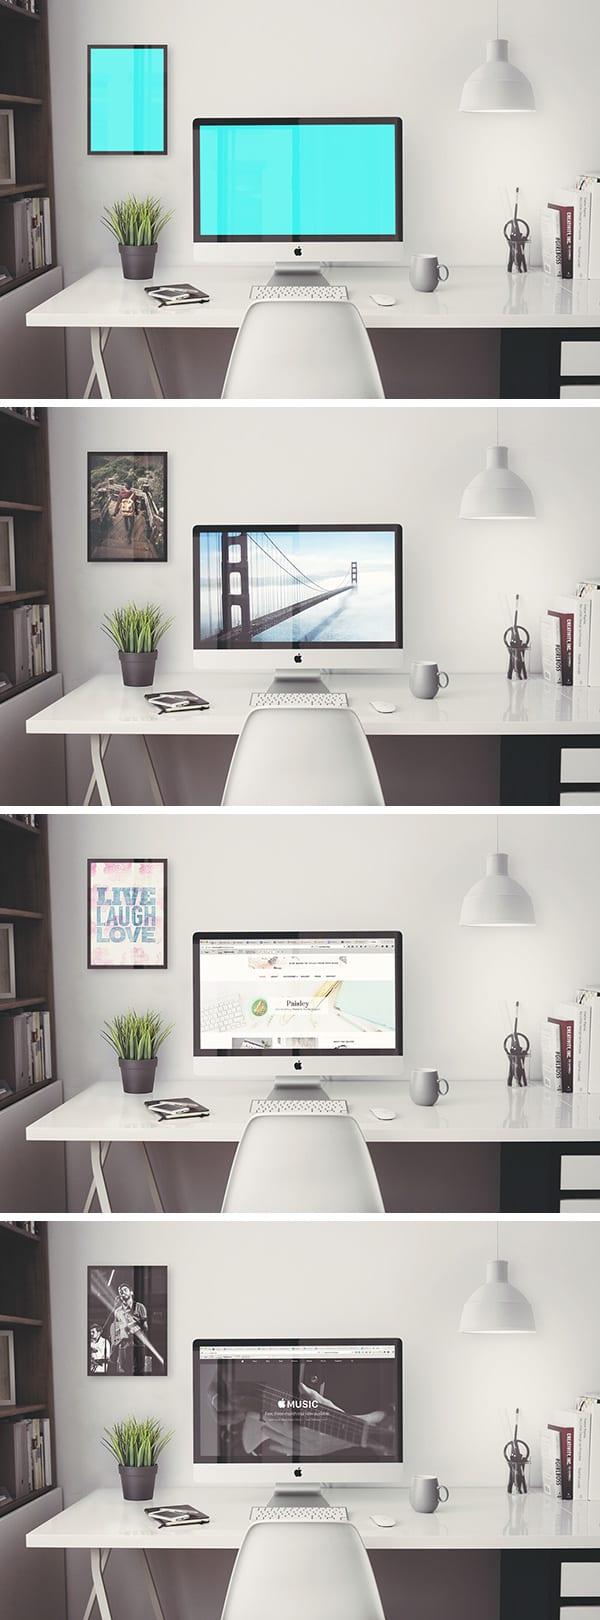 imac retina mockup 600 - Mockup pracovného stola s iMac Retina 5k zadarmo!